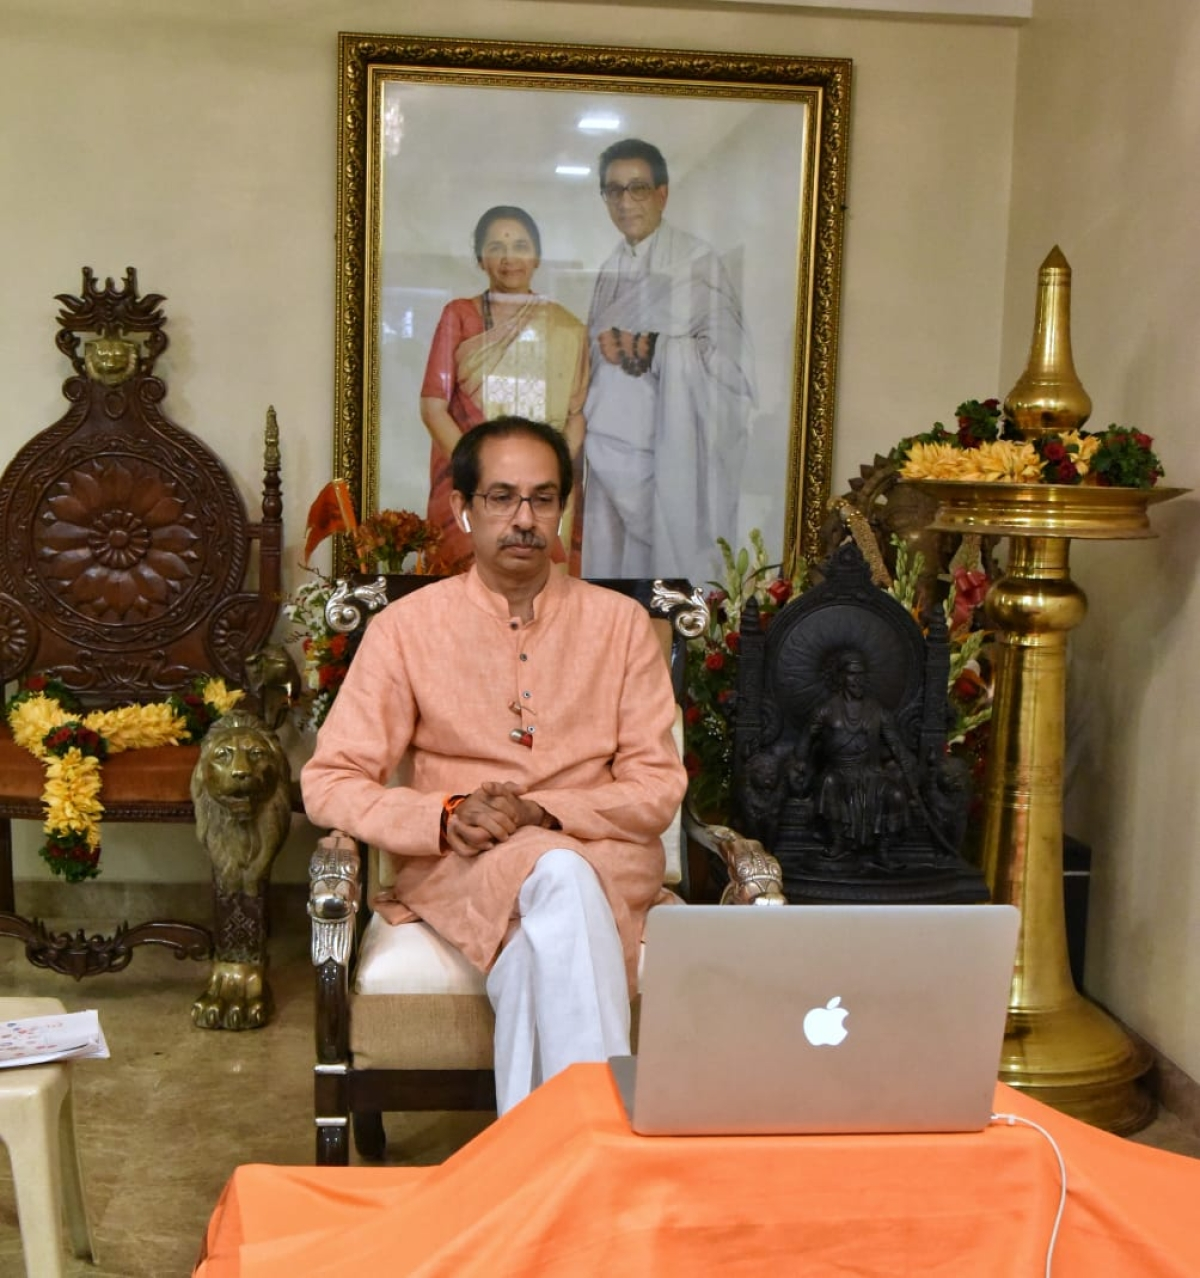 One day, a Shiv Sainik will be PM: Uddhav Thackeray